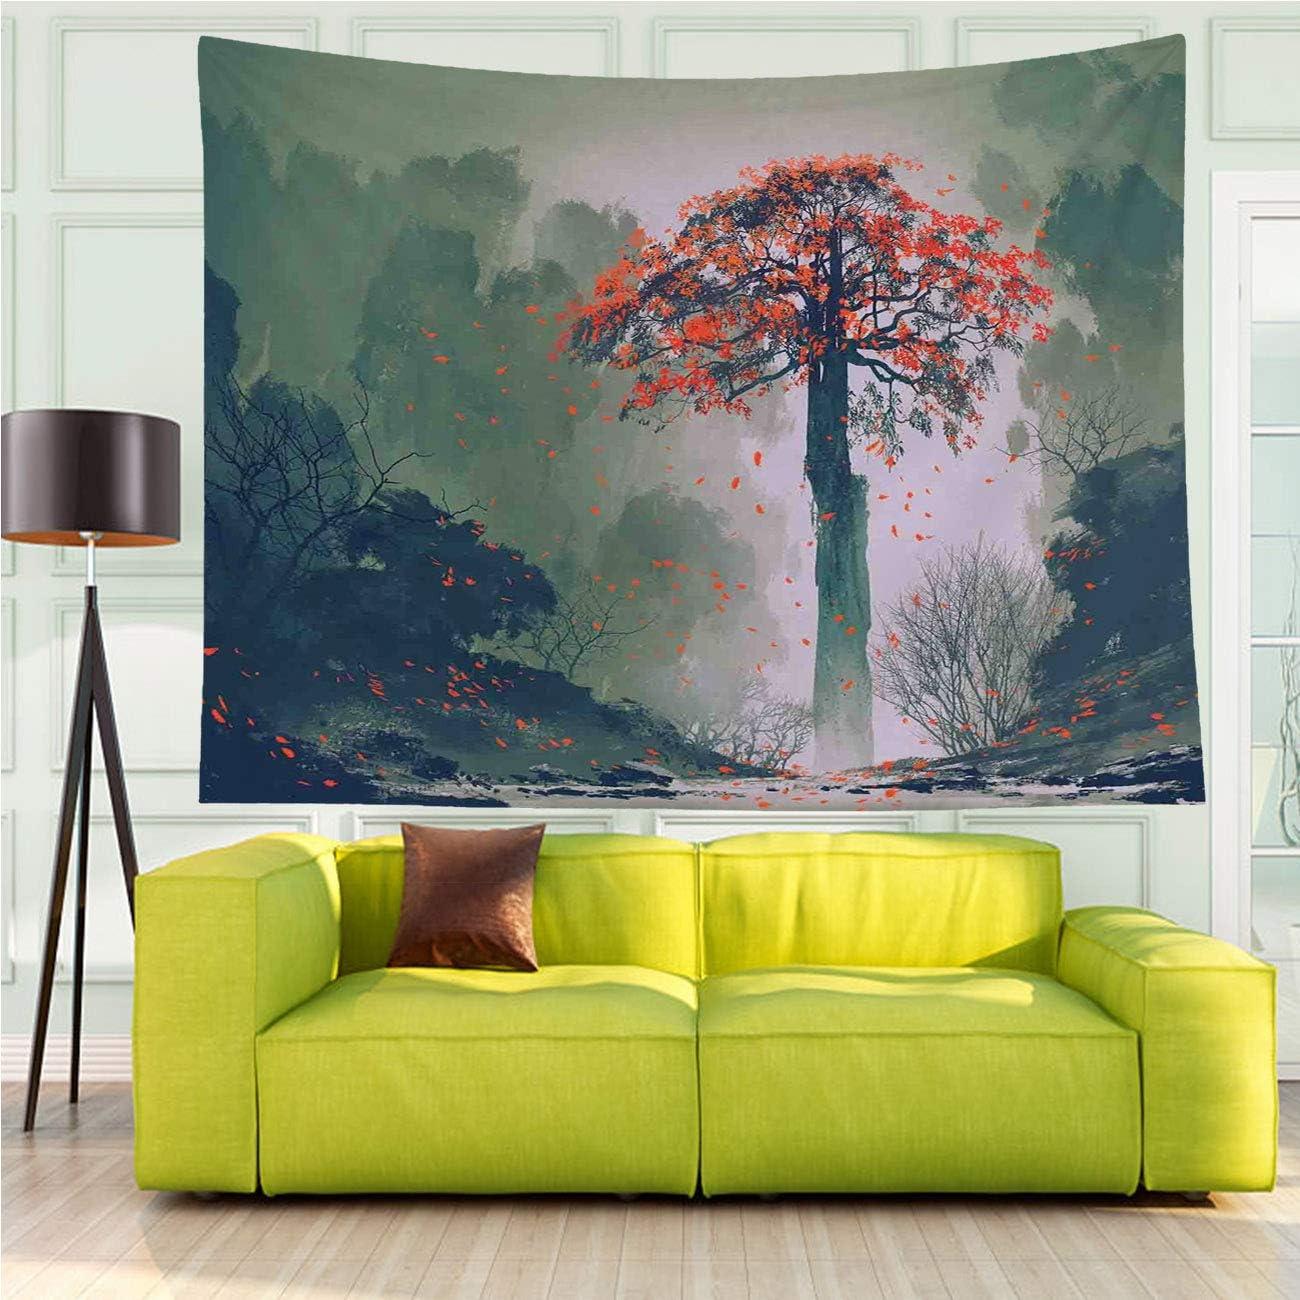 Forest Tapestry Wall Hanging Versatile 正規品スーパーSALE×店内全品キャンペーン Autumn Lonely ブランド買うならブランドオフ Fantasy Tre